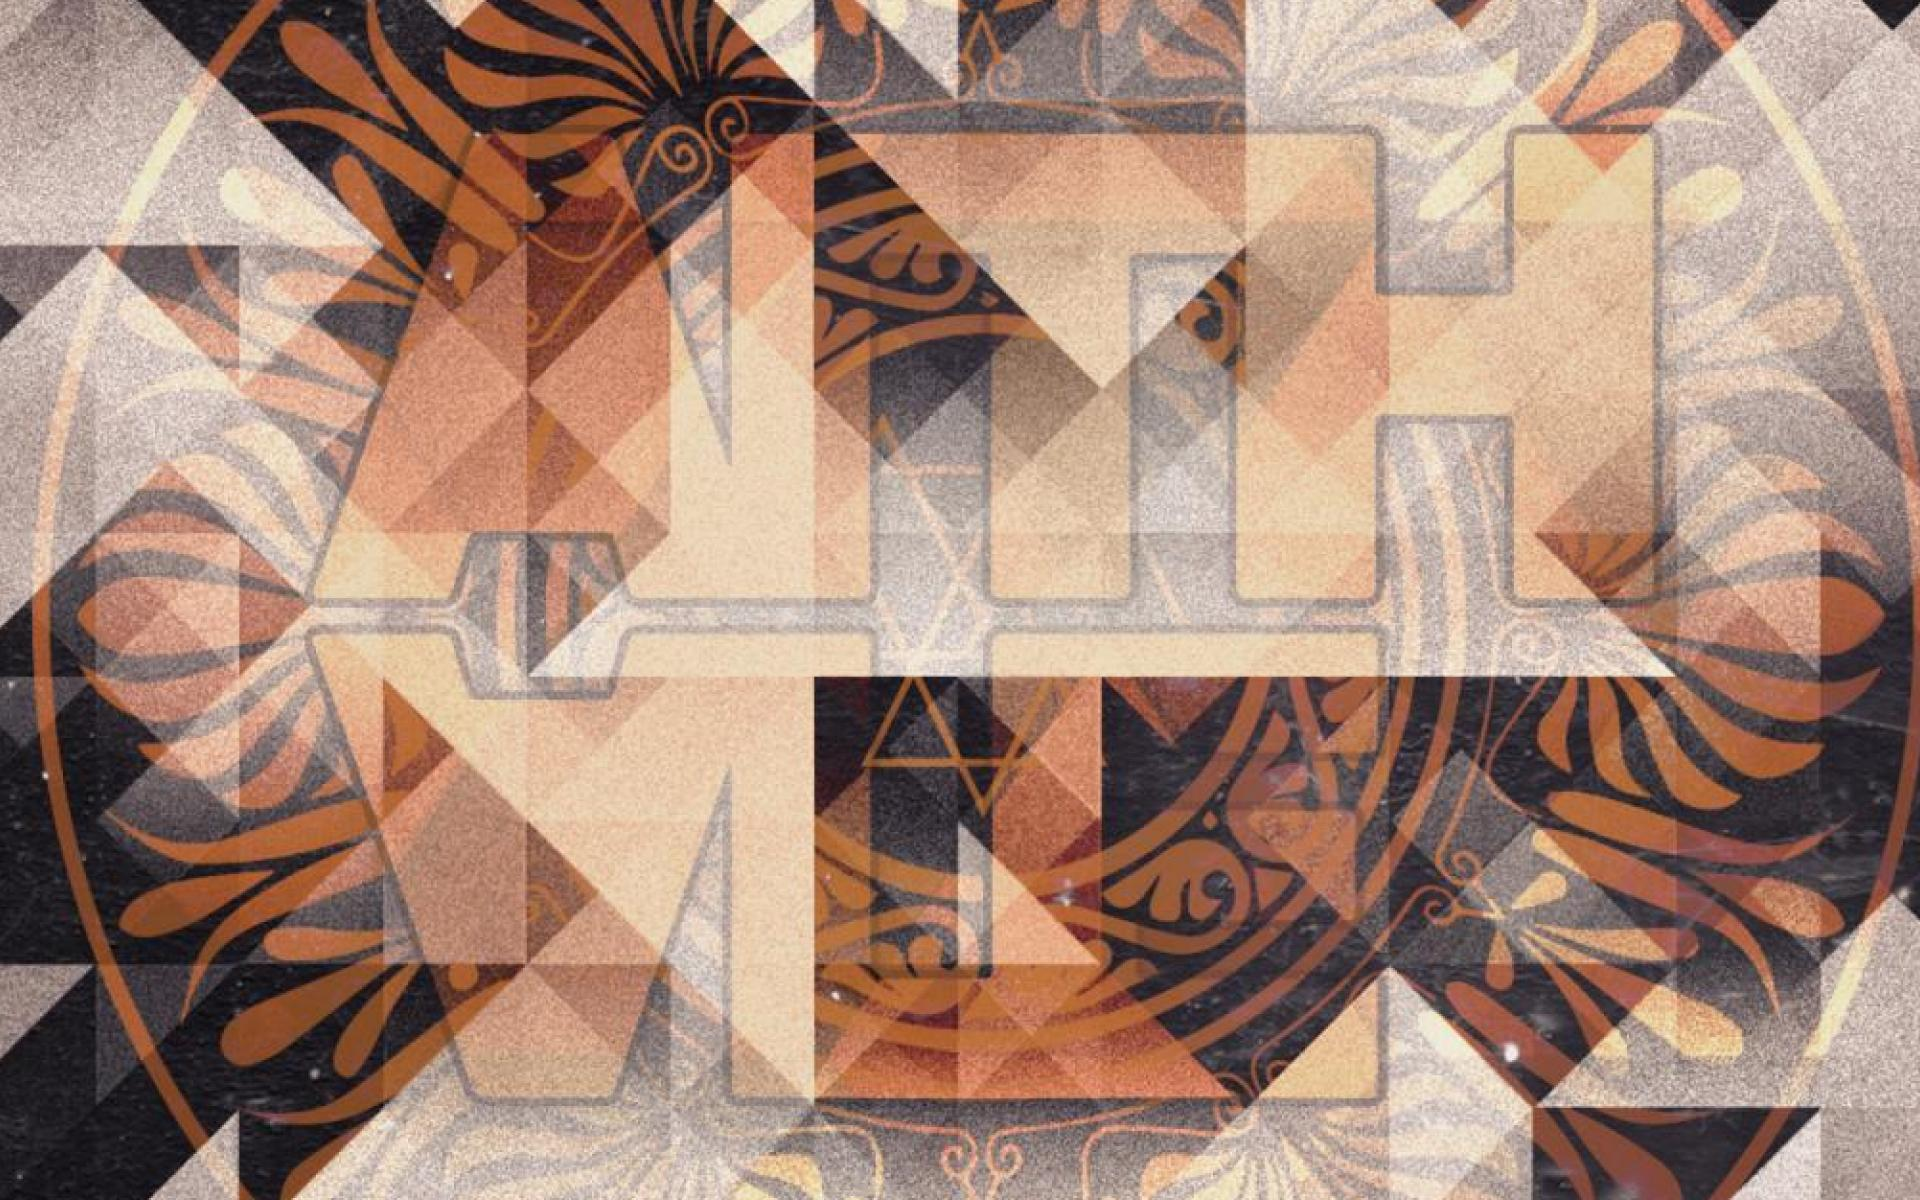 Aithale - Golden Thread